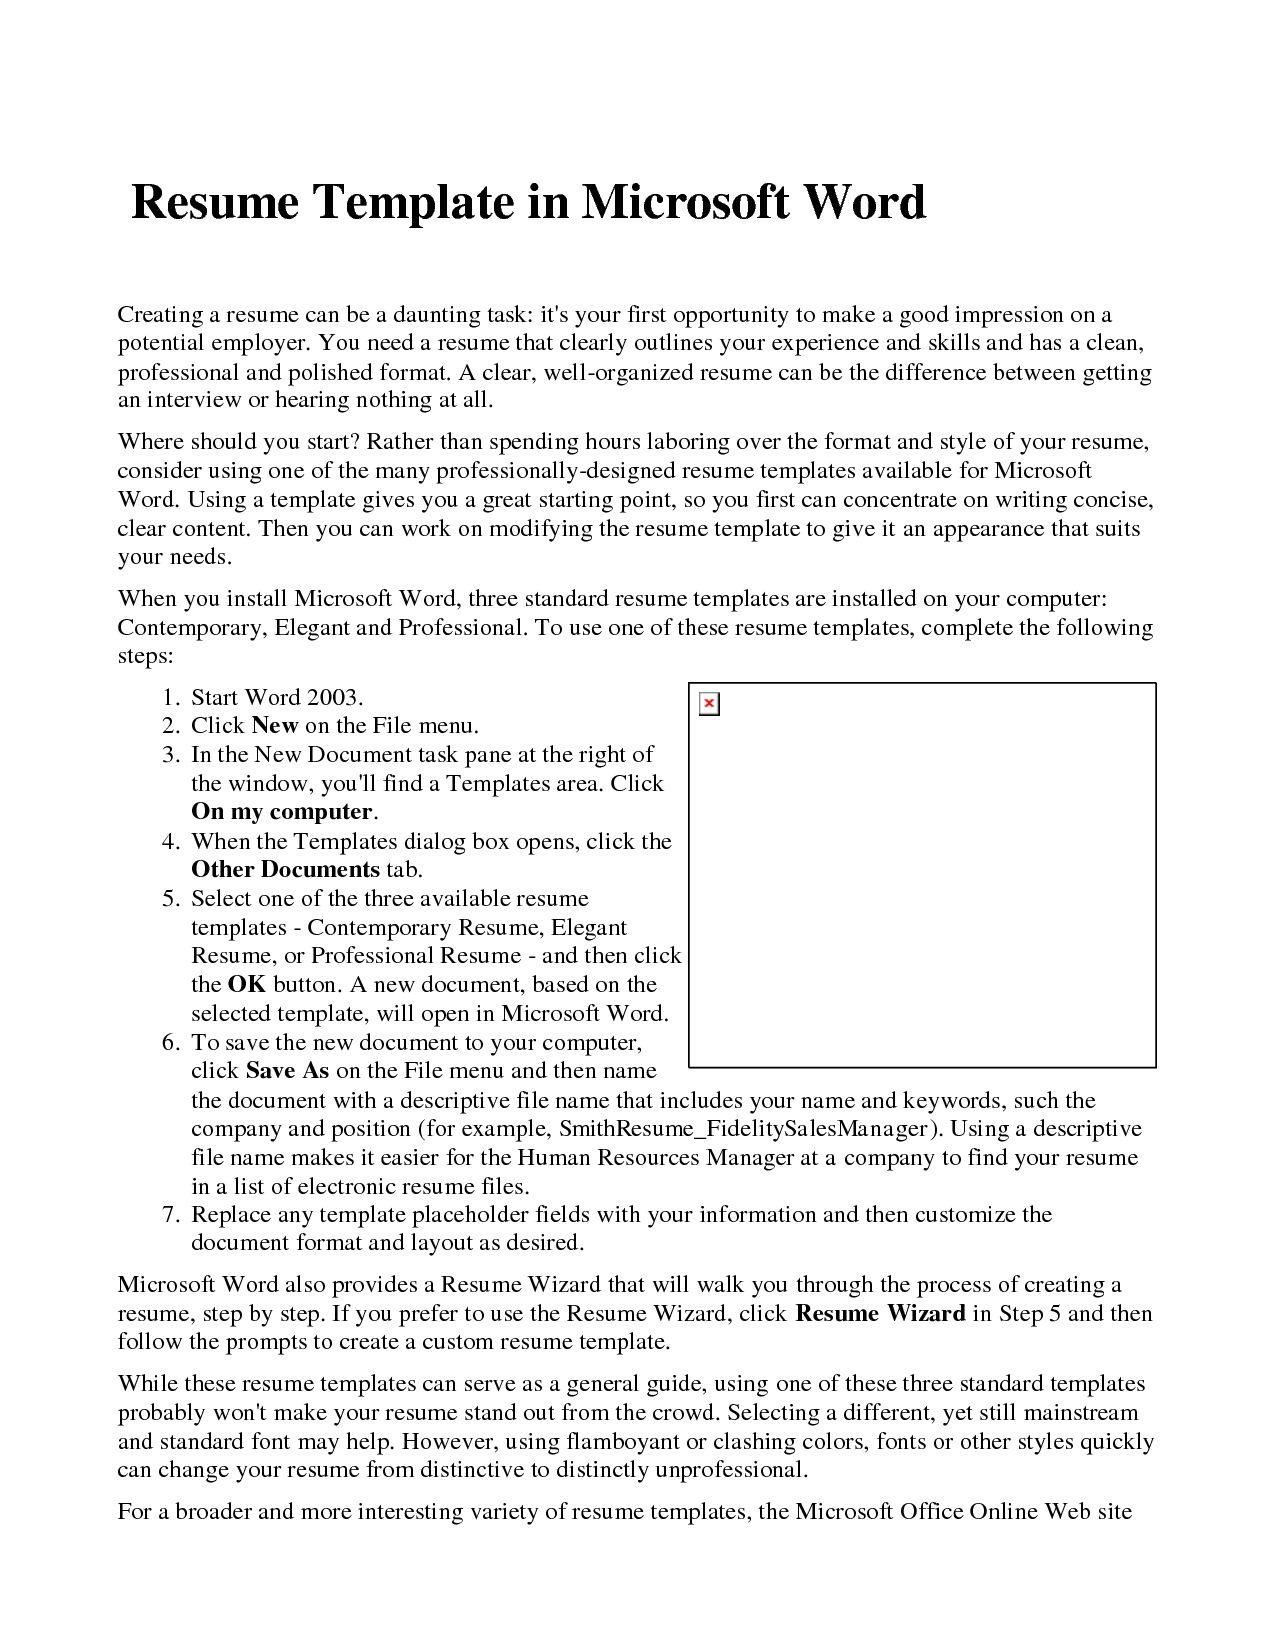 Vistoso Plantilla De Currículum Vitae Microsoft Word 2003 Ornamento ...